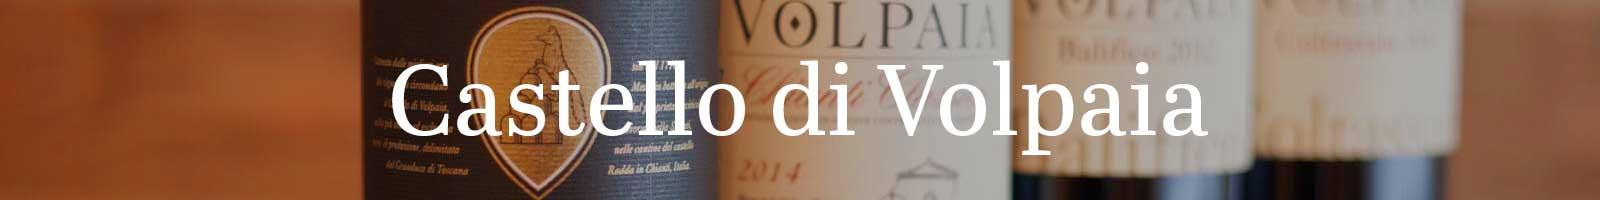 Essential Winemakers of Italy: Castello di Volpaia